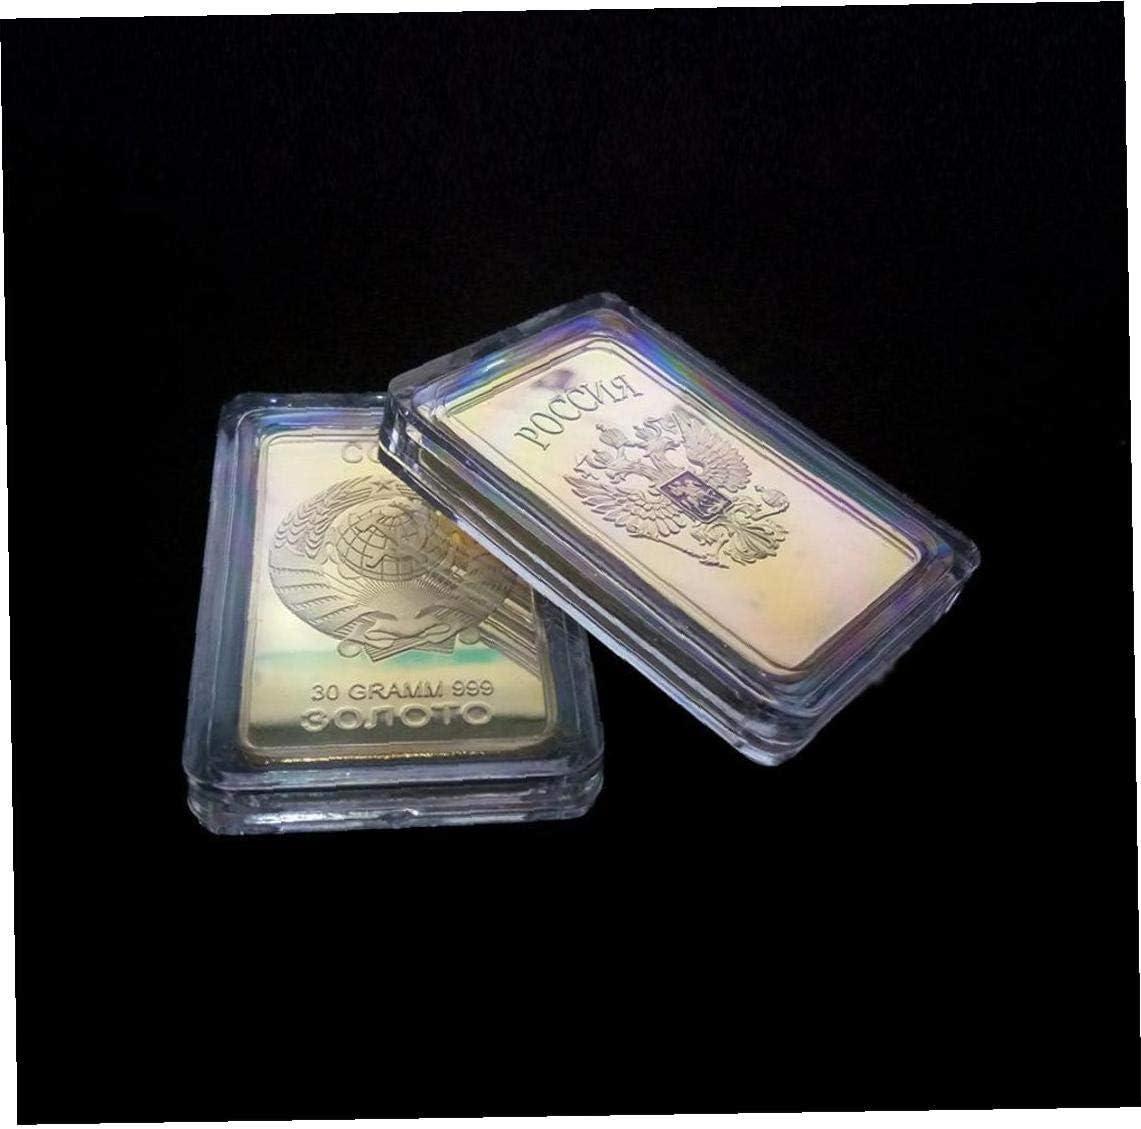 PiniceCore Medaglia Russia Moneta Home Decor Souvenir Soviet Bullion CCCP 24k Bar Monete Commemorative